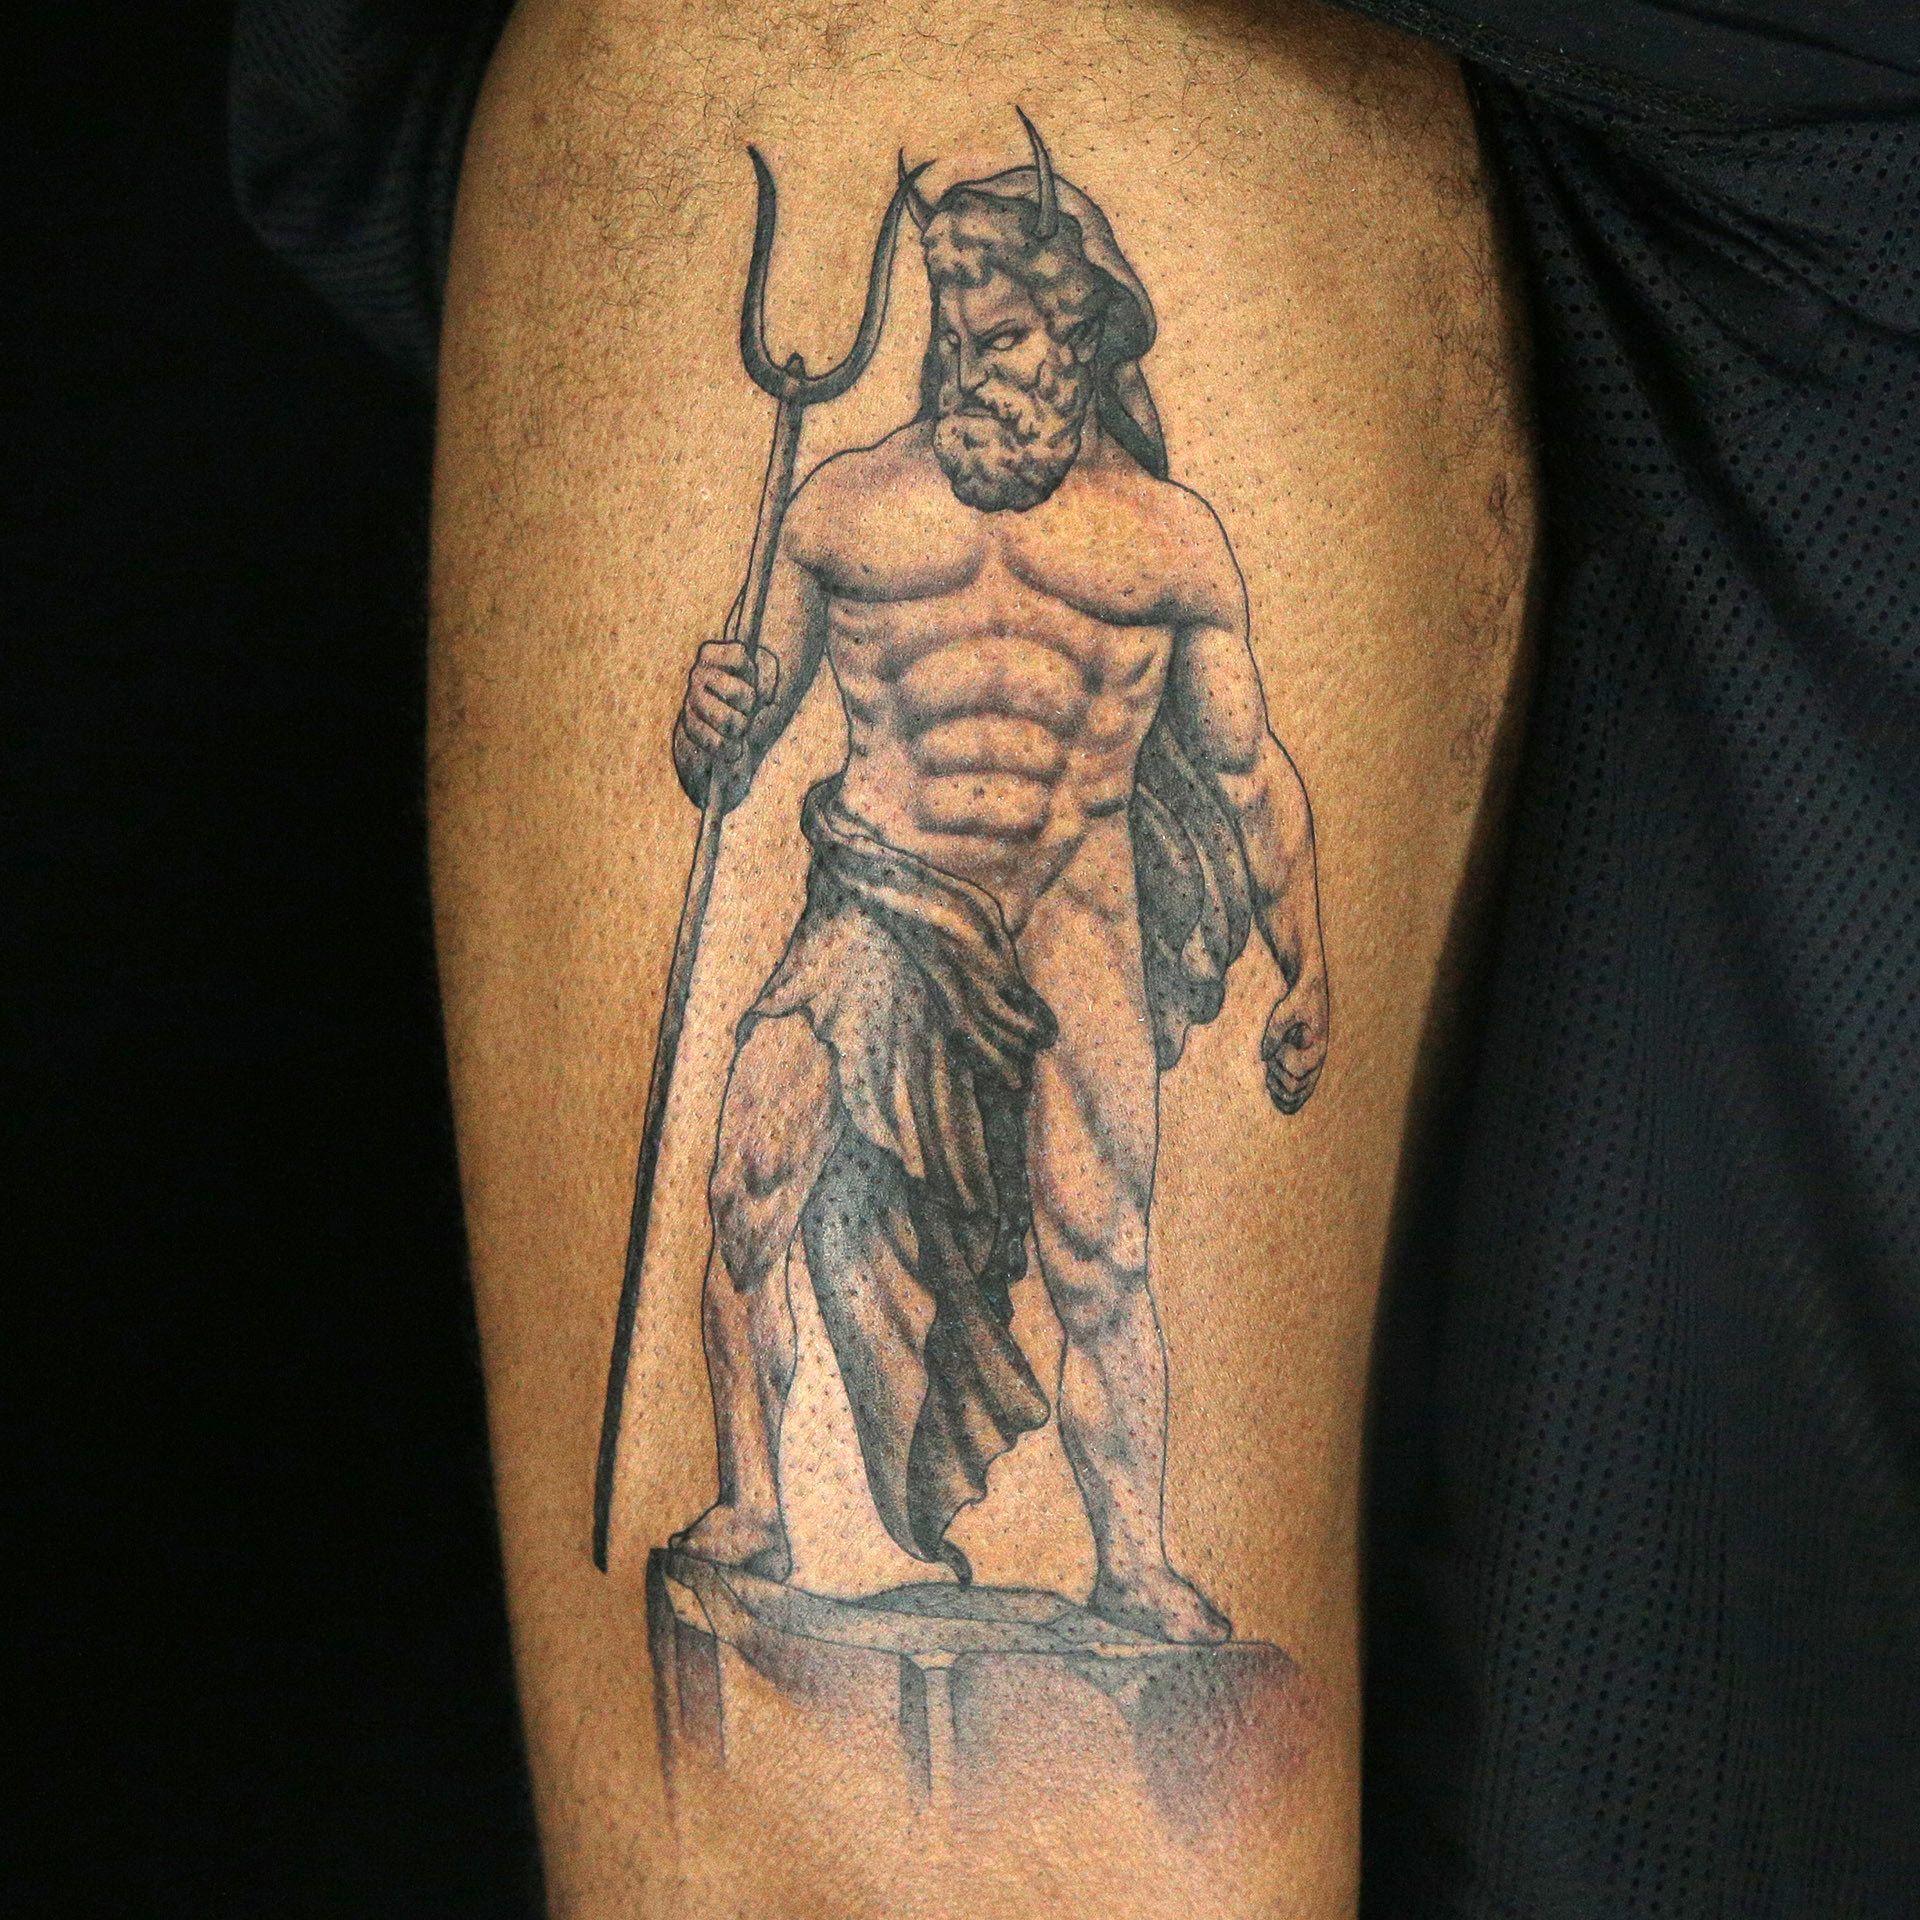 a26492d07 Hades Tattoo by Amanda Leitch | Mythical God Tattoos | Hades tattoo ...